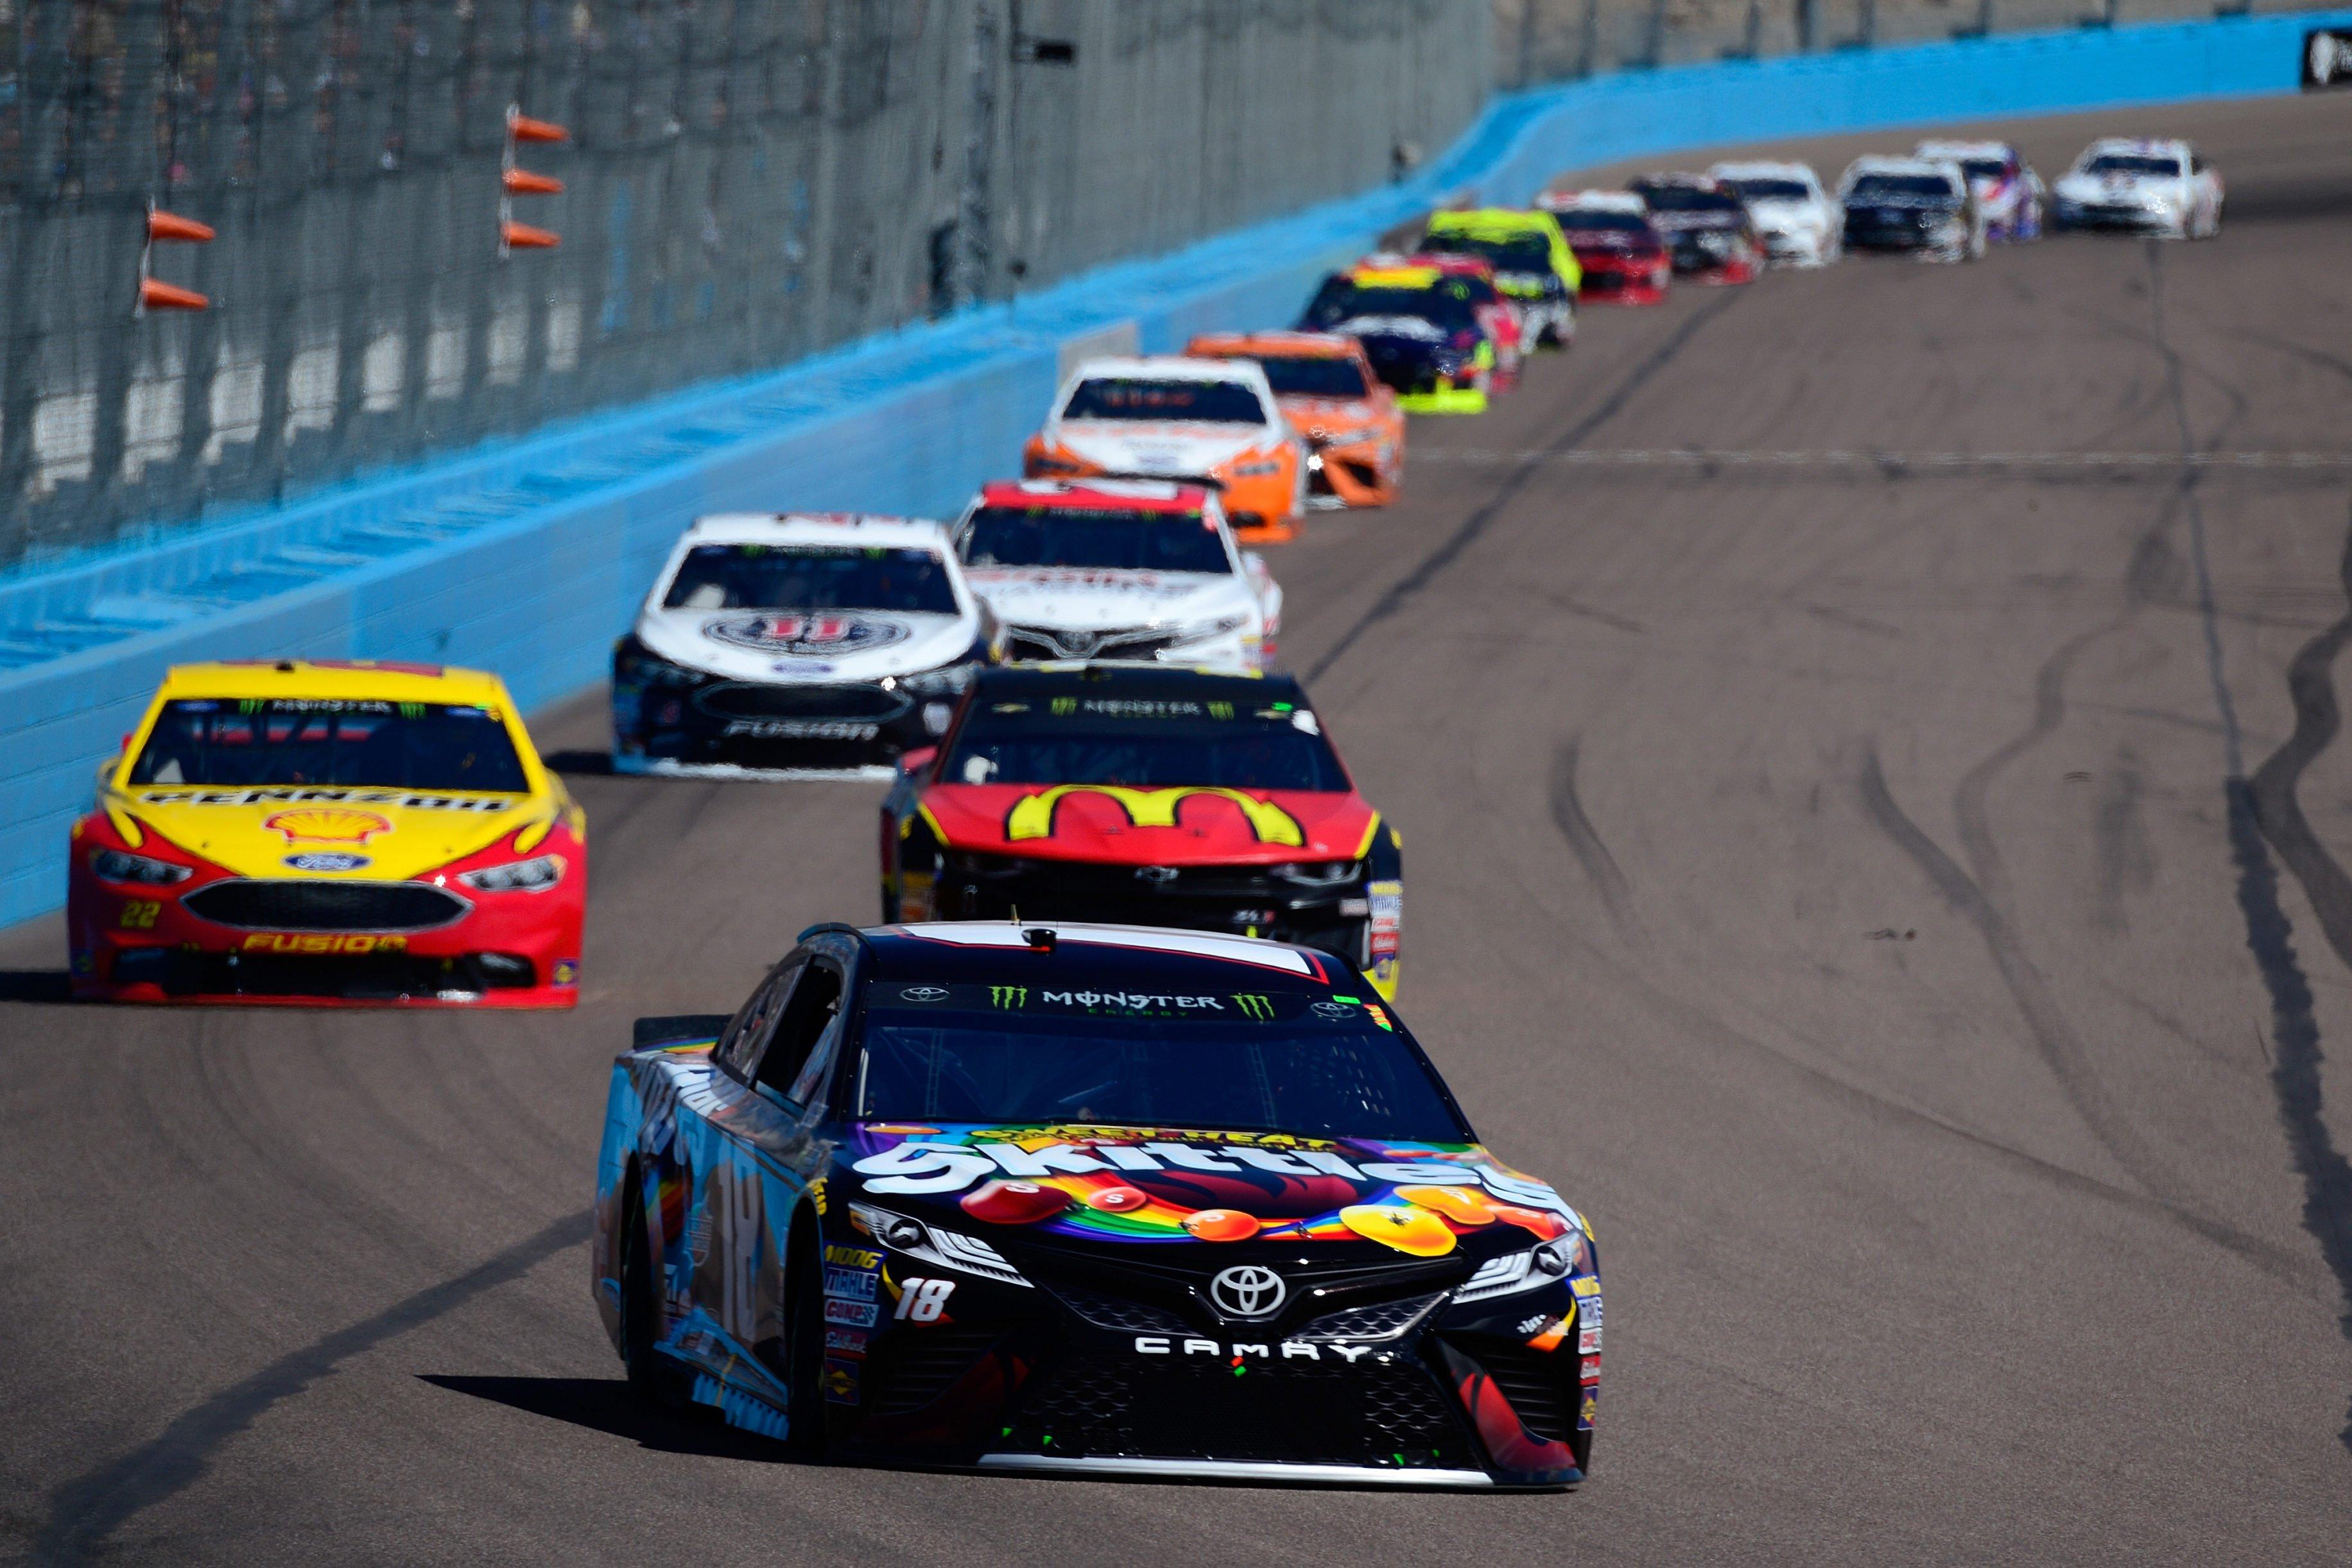 Kyle Busch leads at ISM Raceway